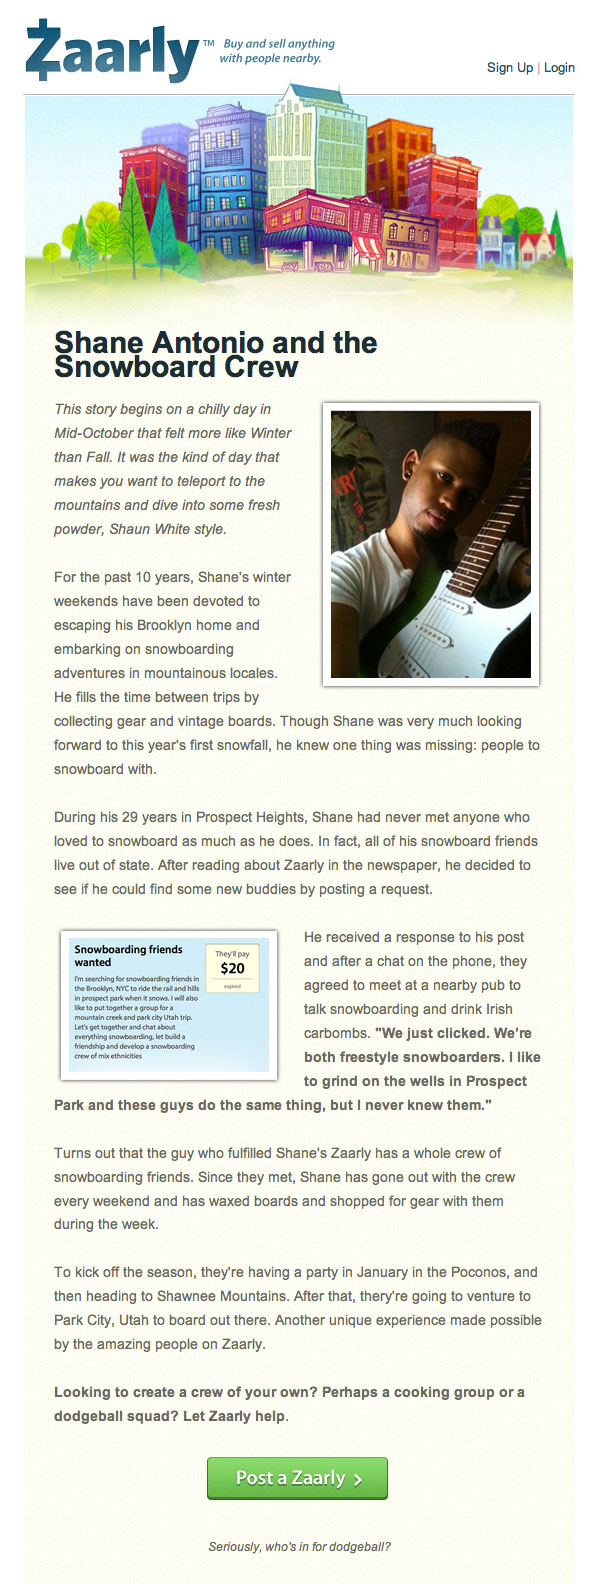 Zaarly Email Marketing